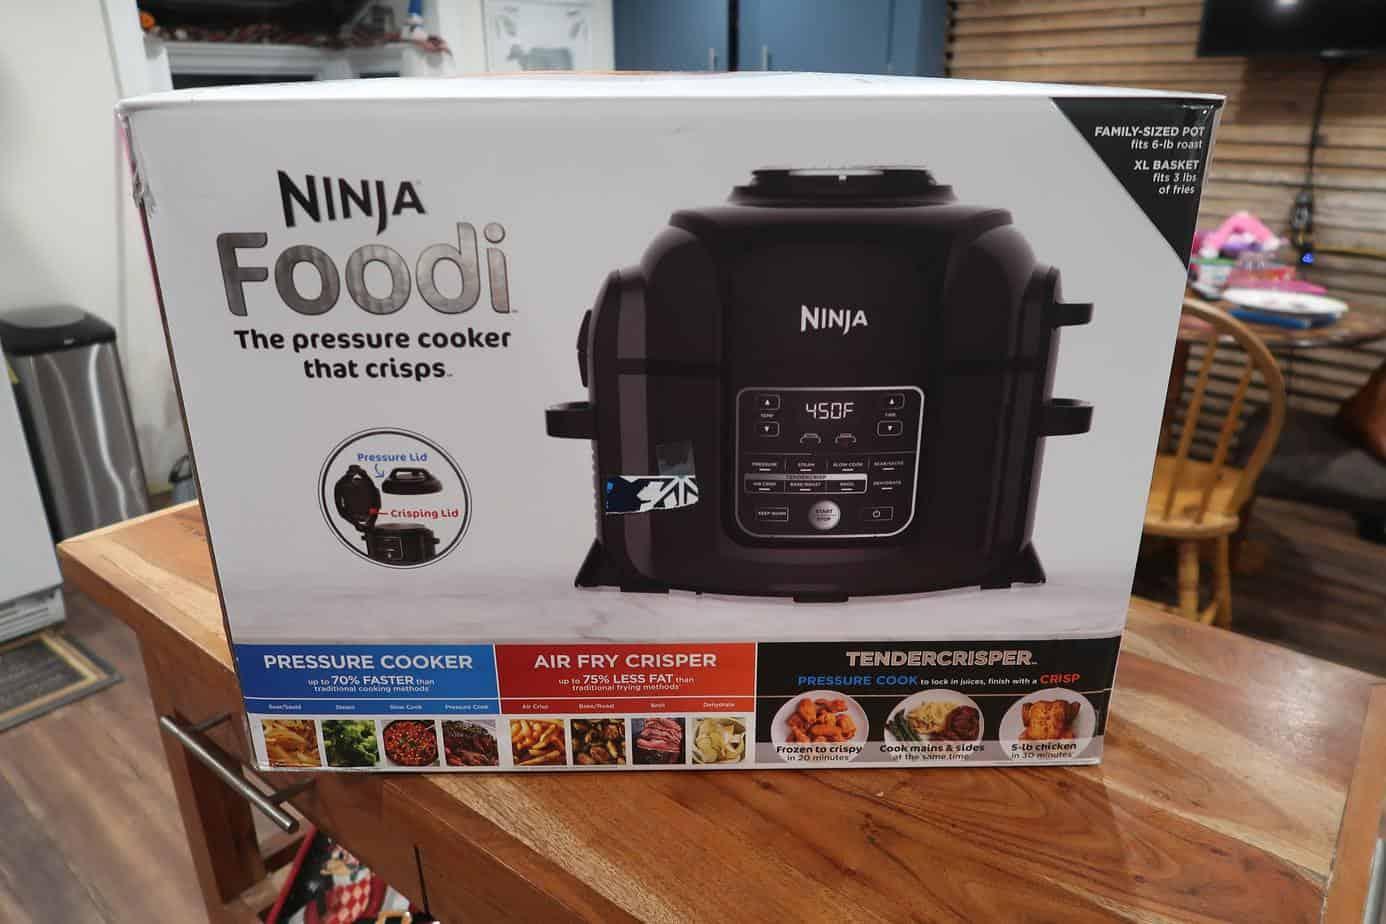 ninja foodi review frugal farm girl